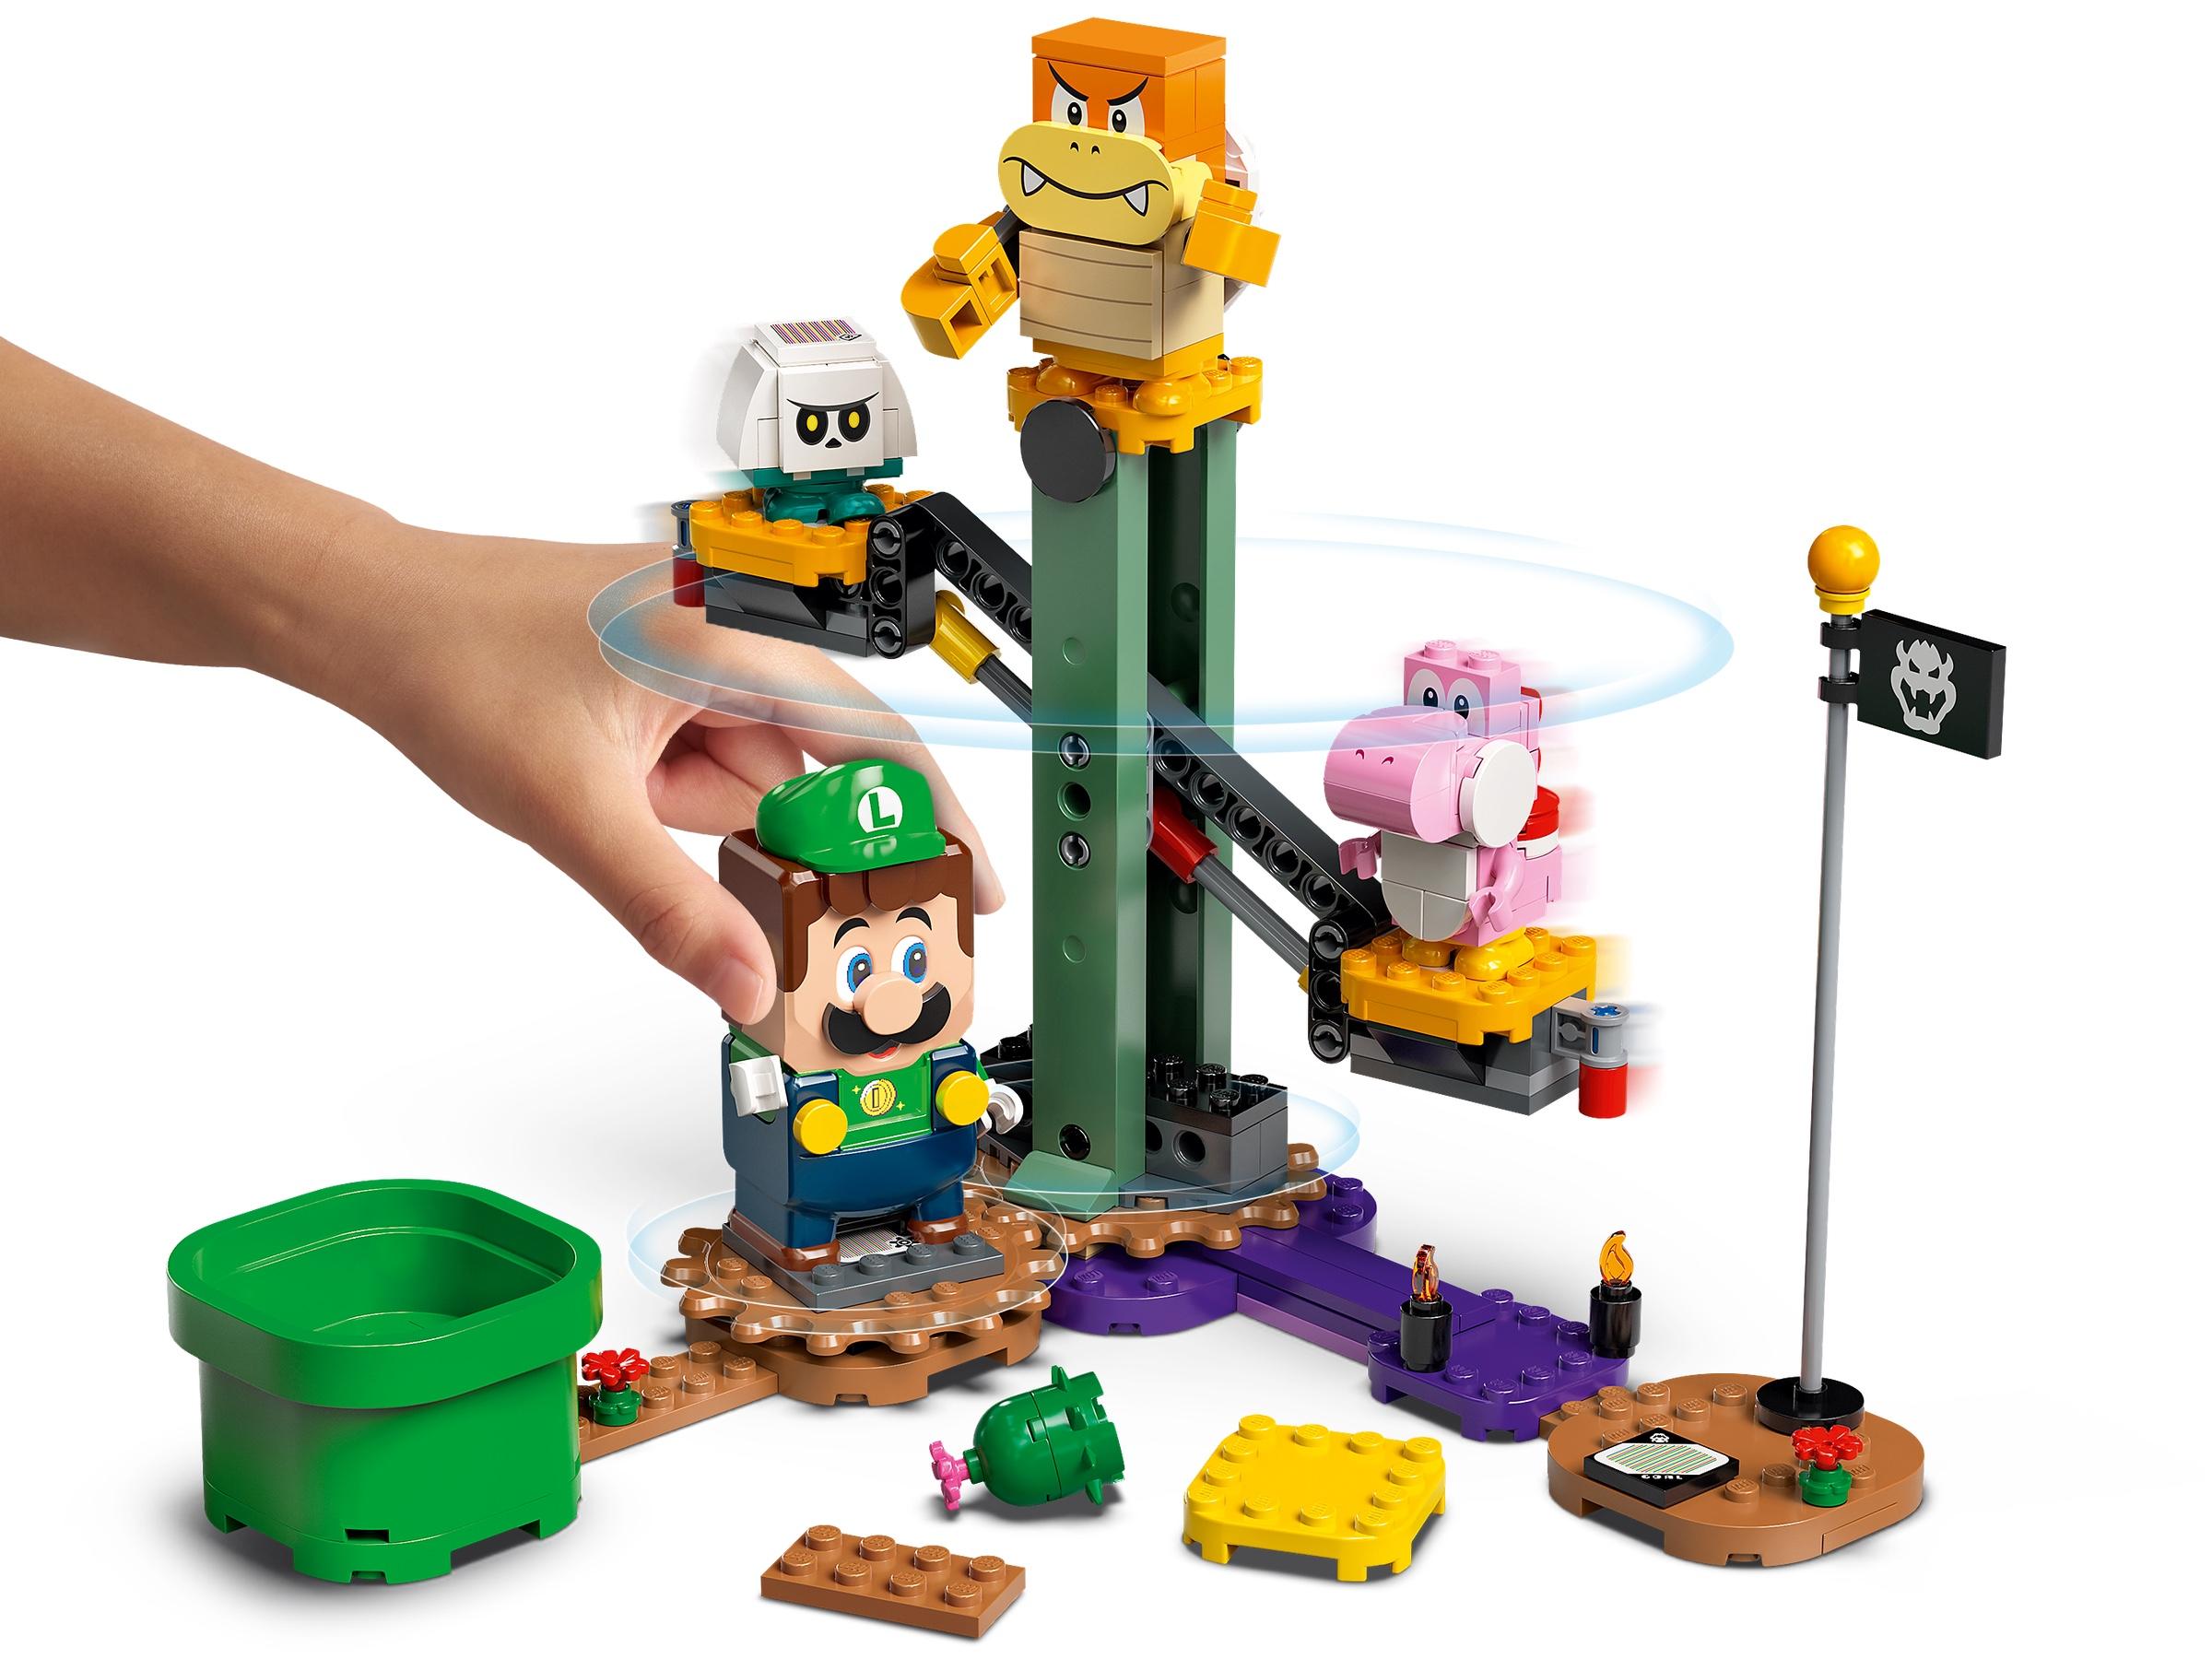 Lego Super Mario Adventures with Luigi Starter Course playset